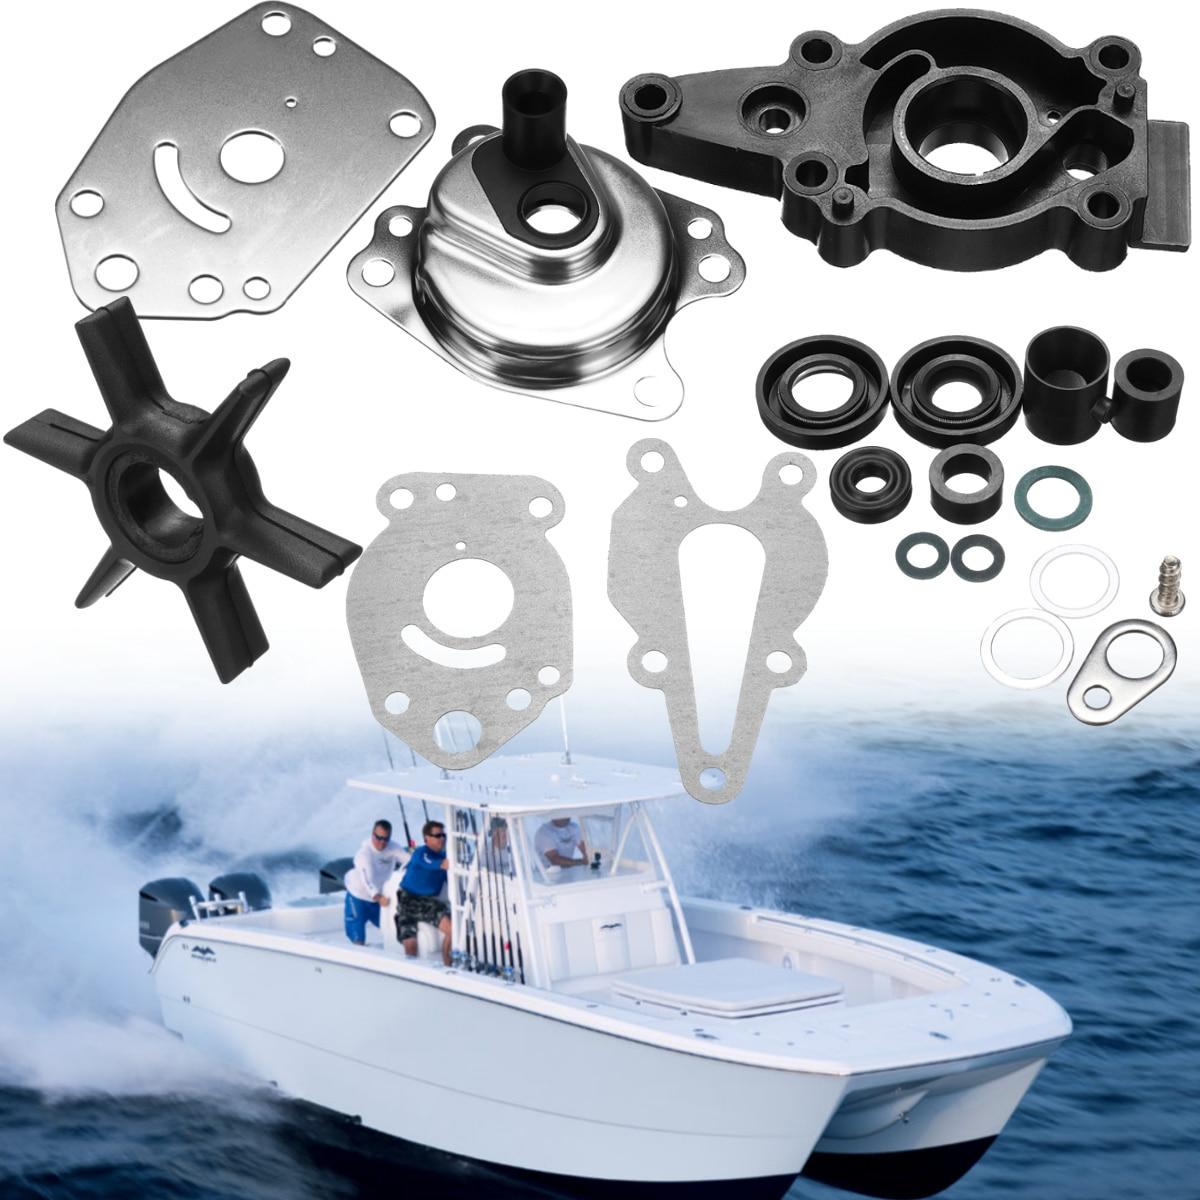 Marine Boat Water Pump Impeller Repair Kit for Mercury 6/8/9.9/15-HP 46-42089A5 6 Blades 4 Stroke Approx 60mm Tool Parts колесные диски yamato minamoto no eritomo 8 5x19 5x112 et39 66 6 roxx marine